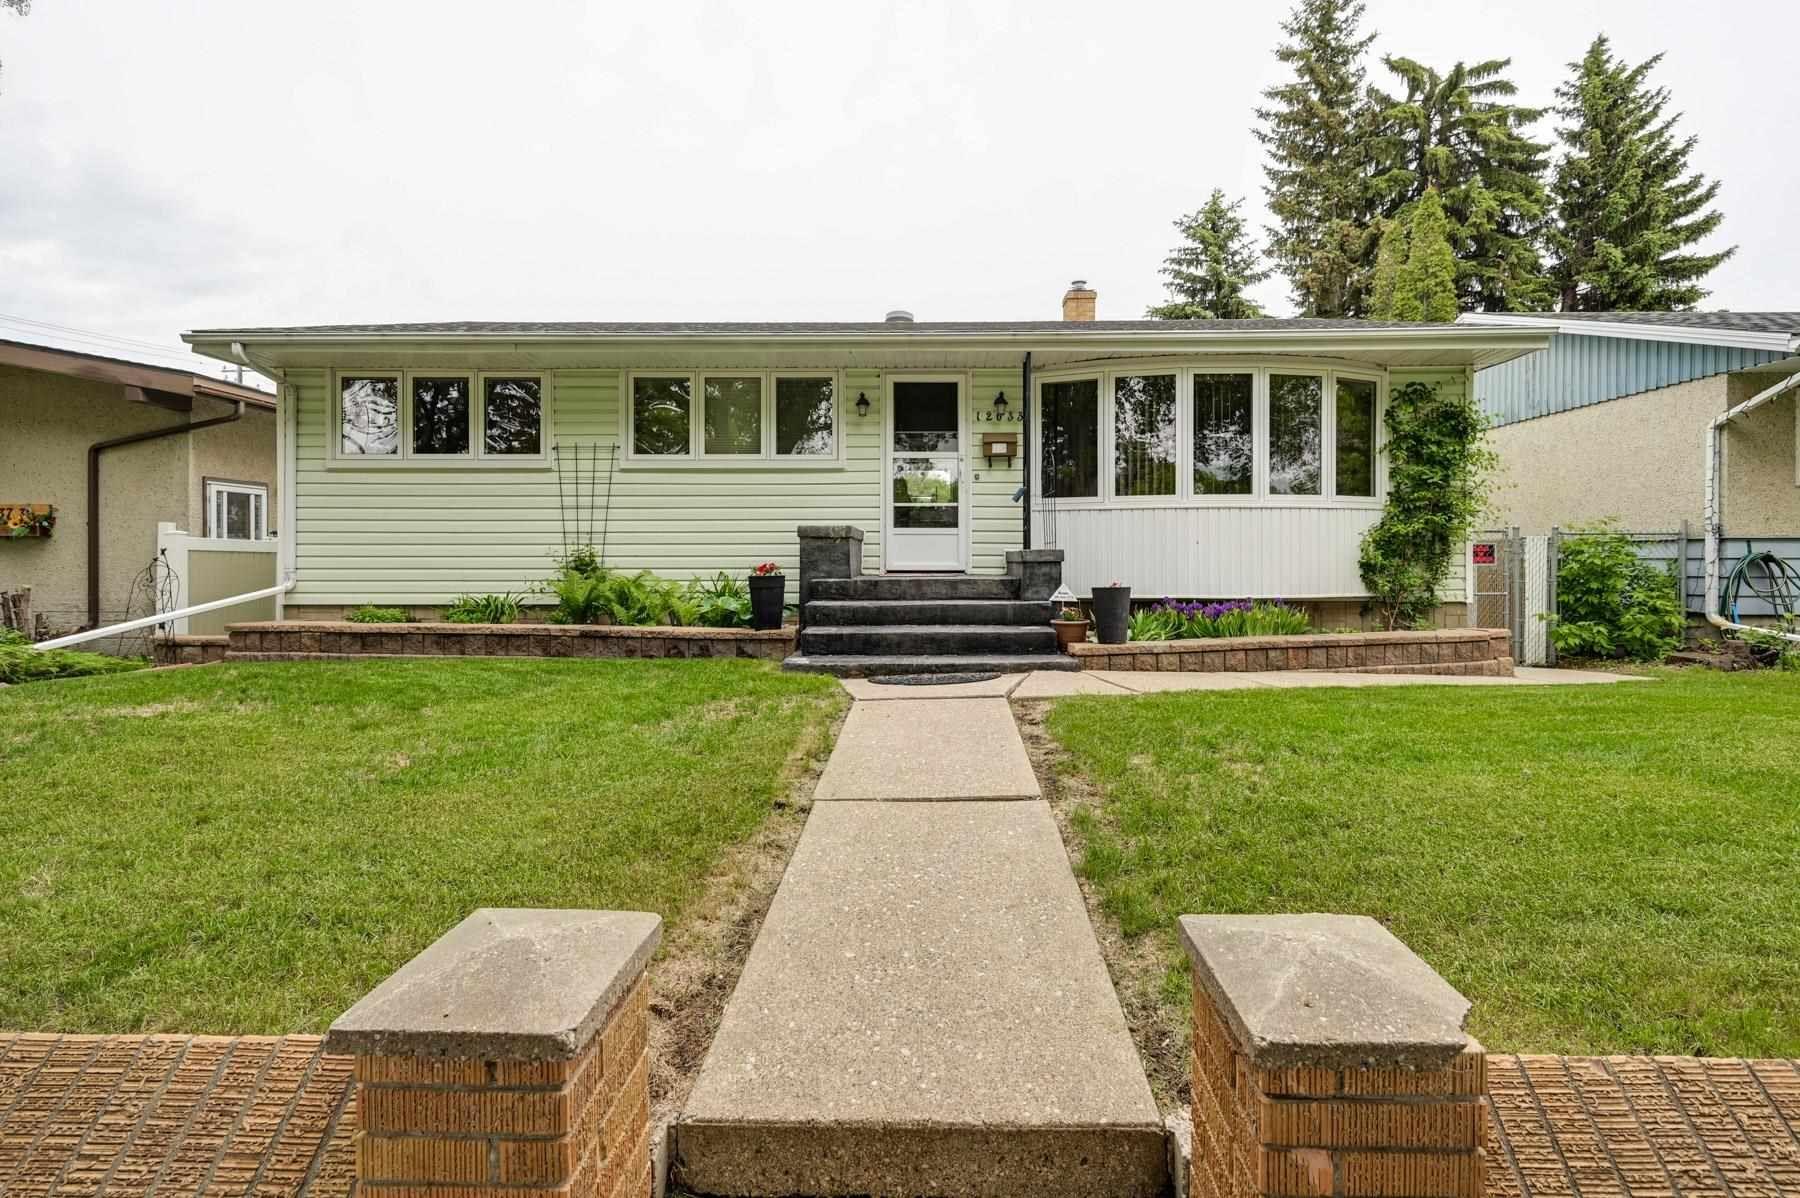 Main Photo: 12033 39 Street in Edmonton: Zone 23 House for sale : MLS®# E4248928